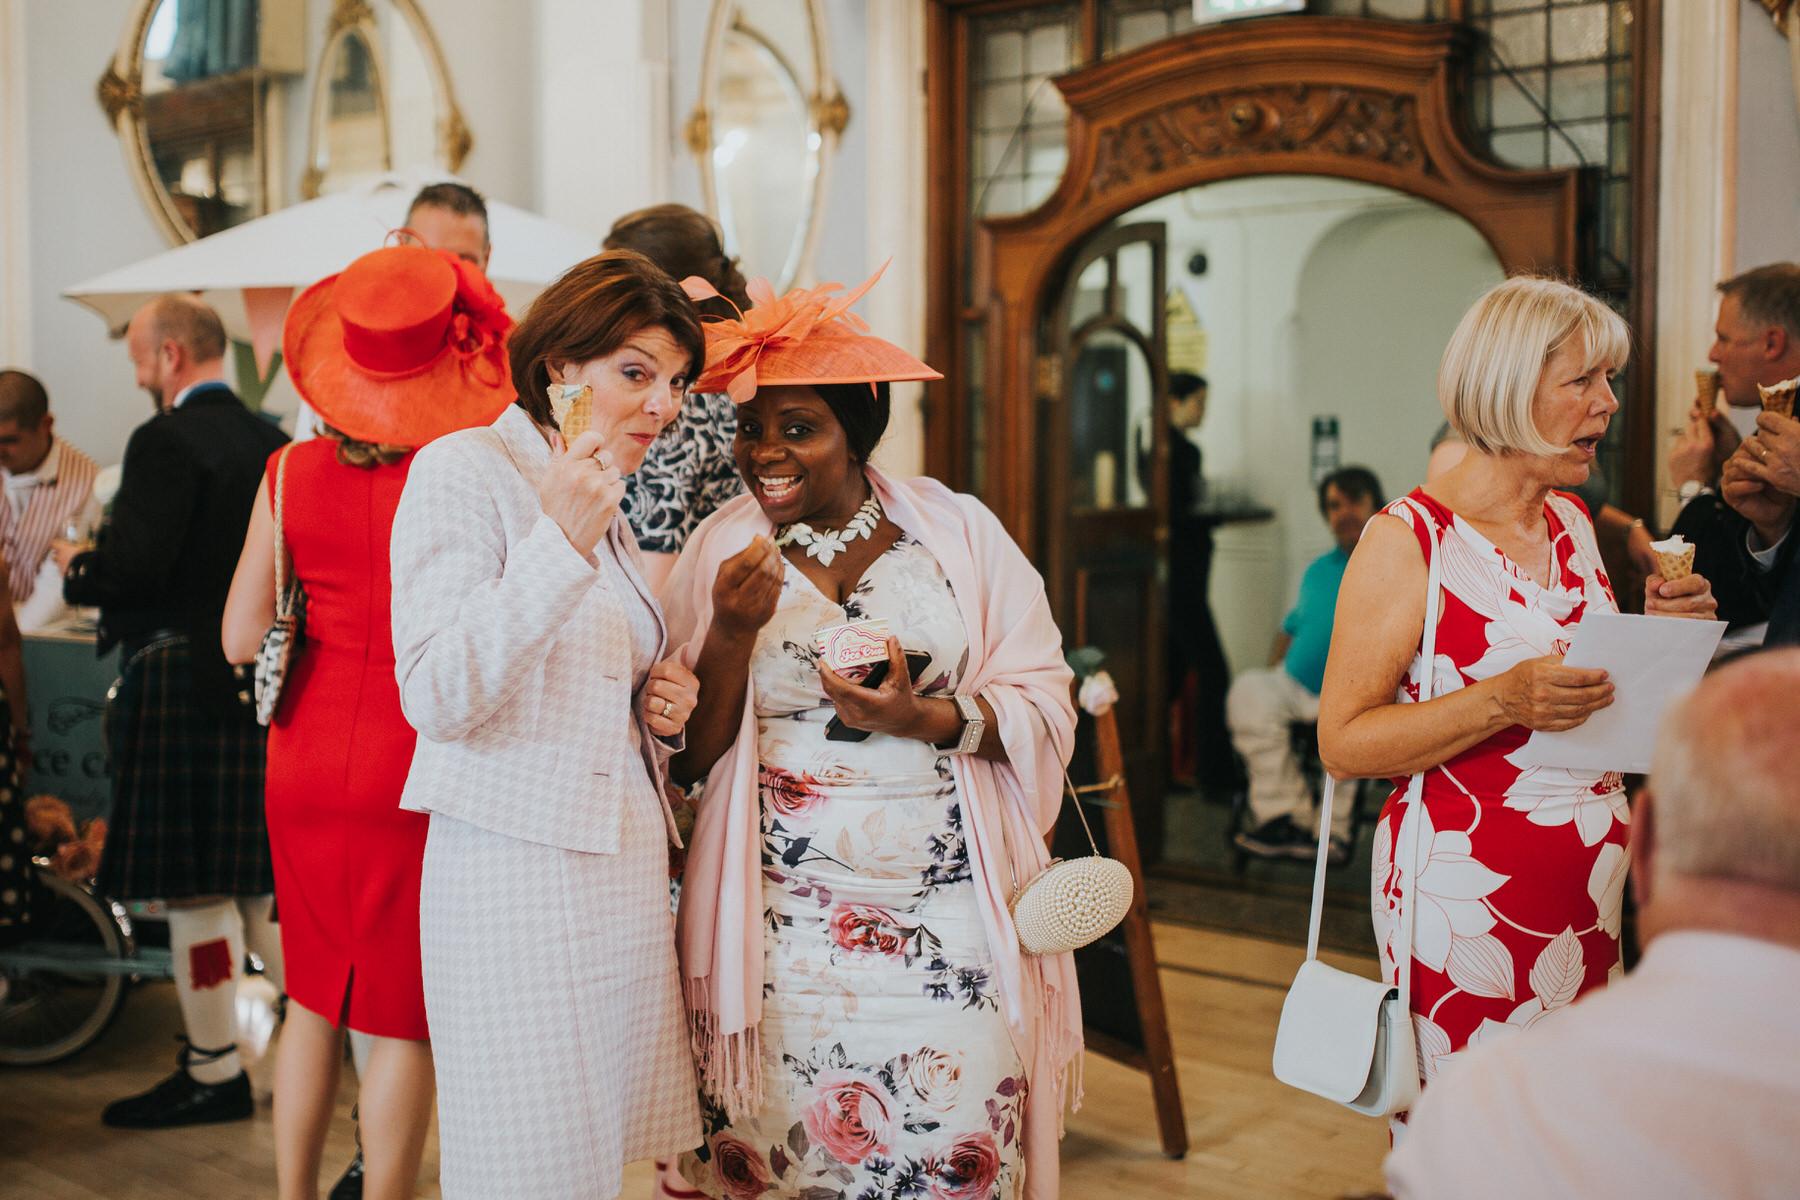 260 Old Finsbury Town Hall wedding guests eating icecream.jpg